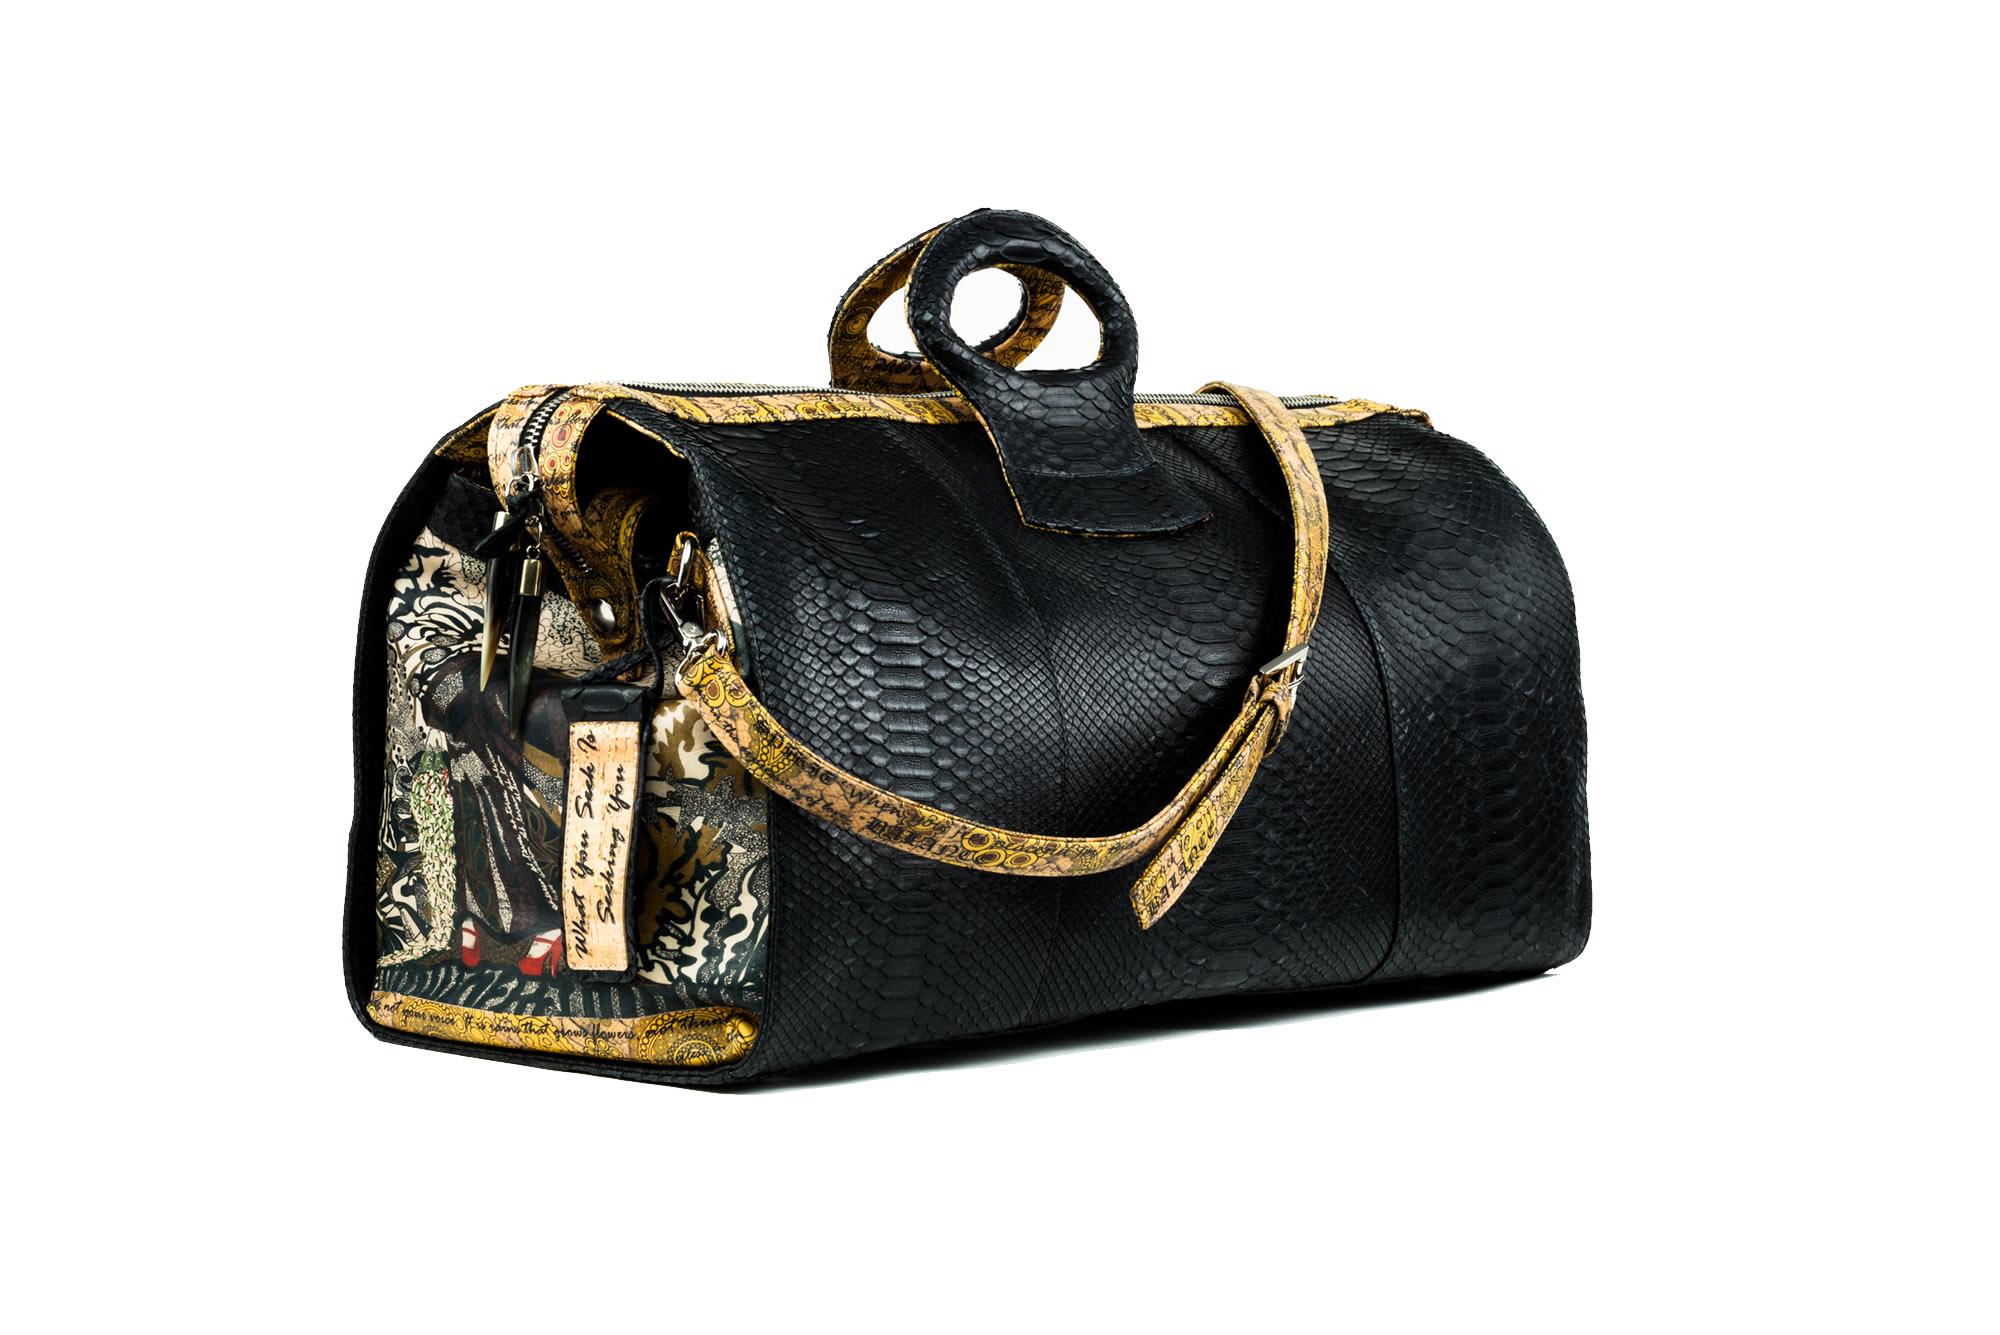 duffel-lady-t-python duffel-ganesh-python hand bag black